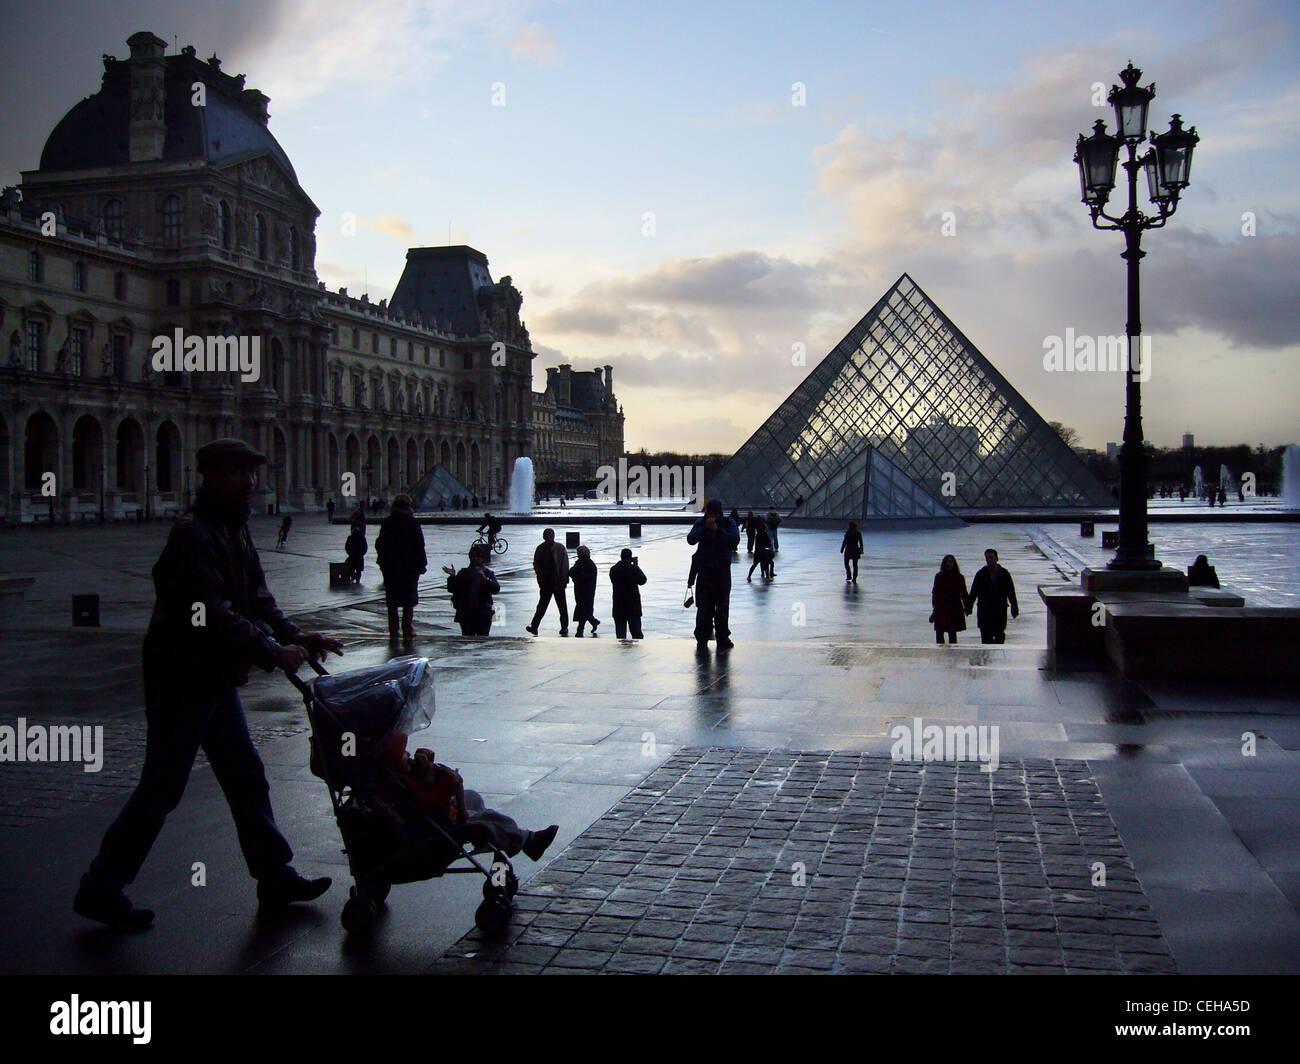 Silhouettes on a rainy day in Place du Carrousel du Louvre, Paris, France Stock Photo